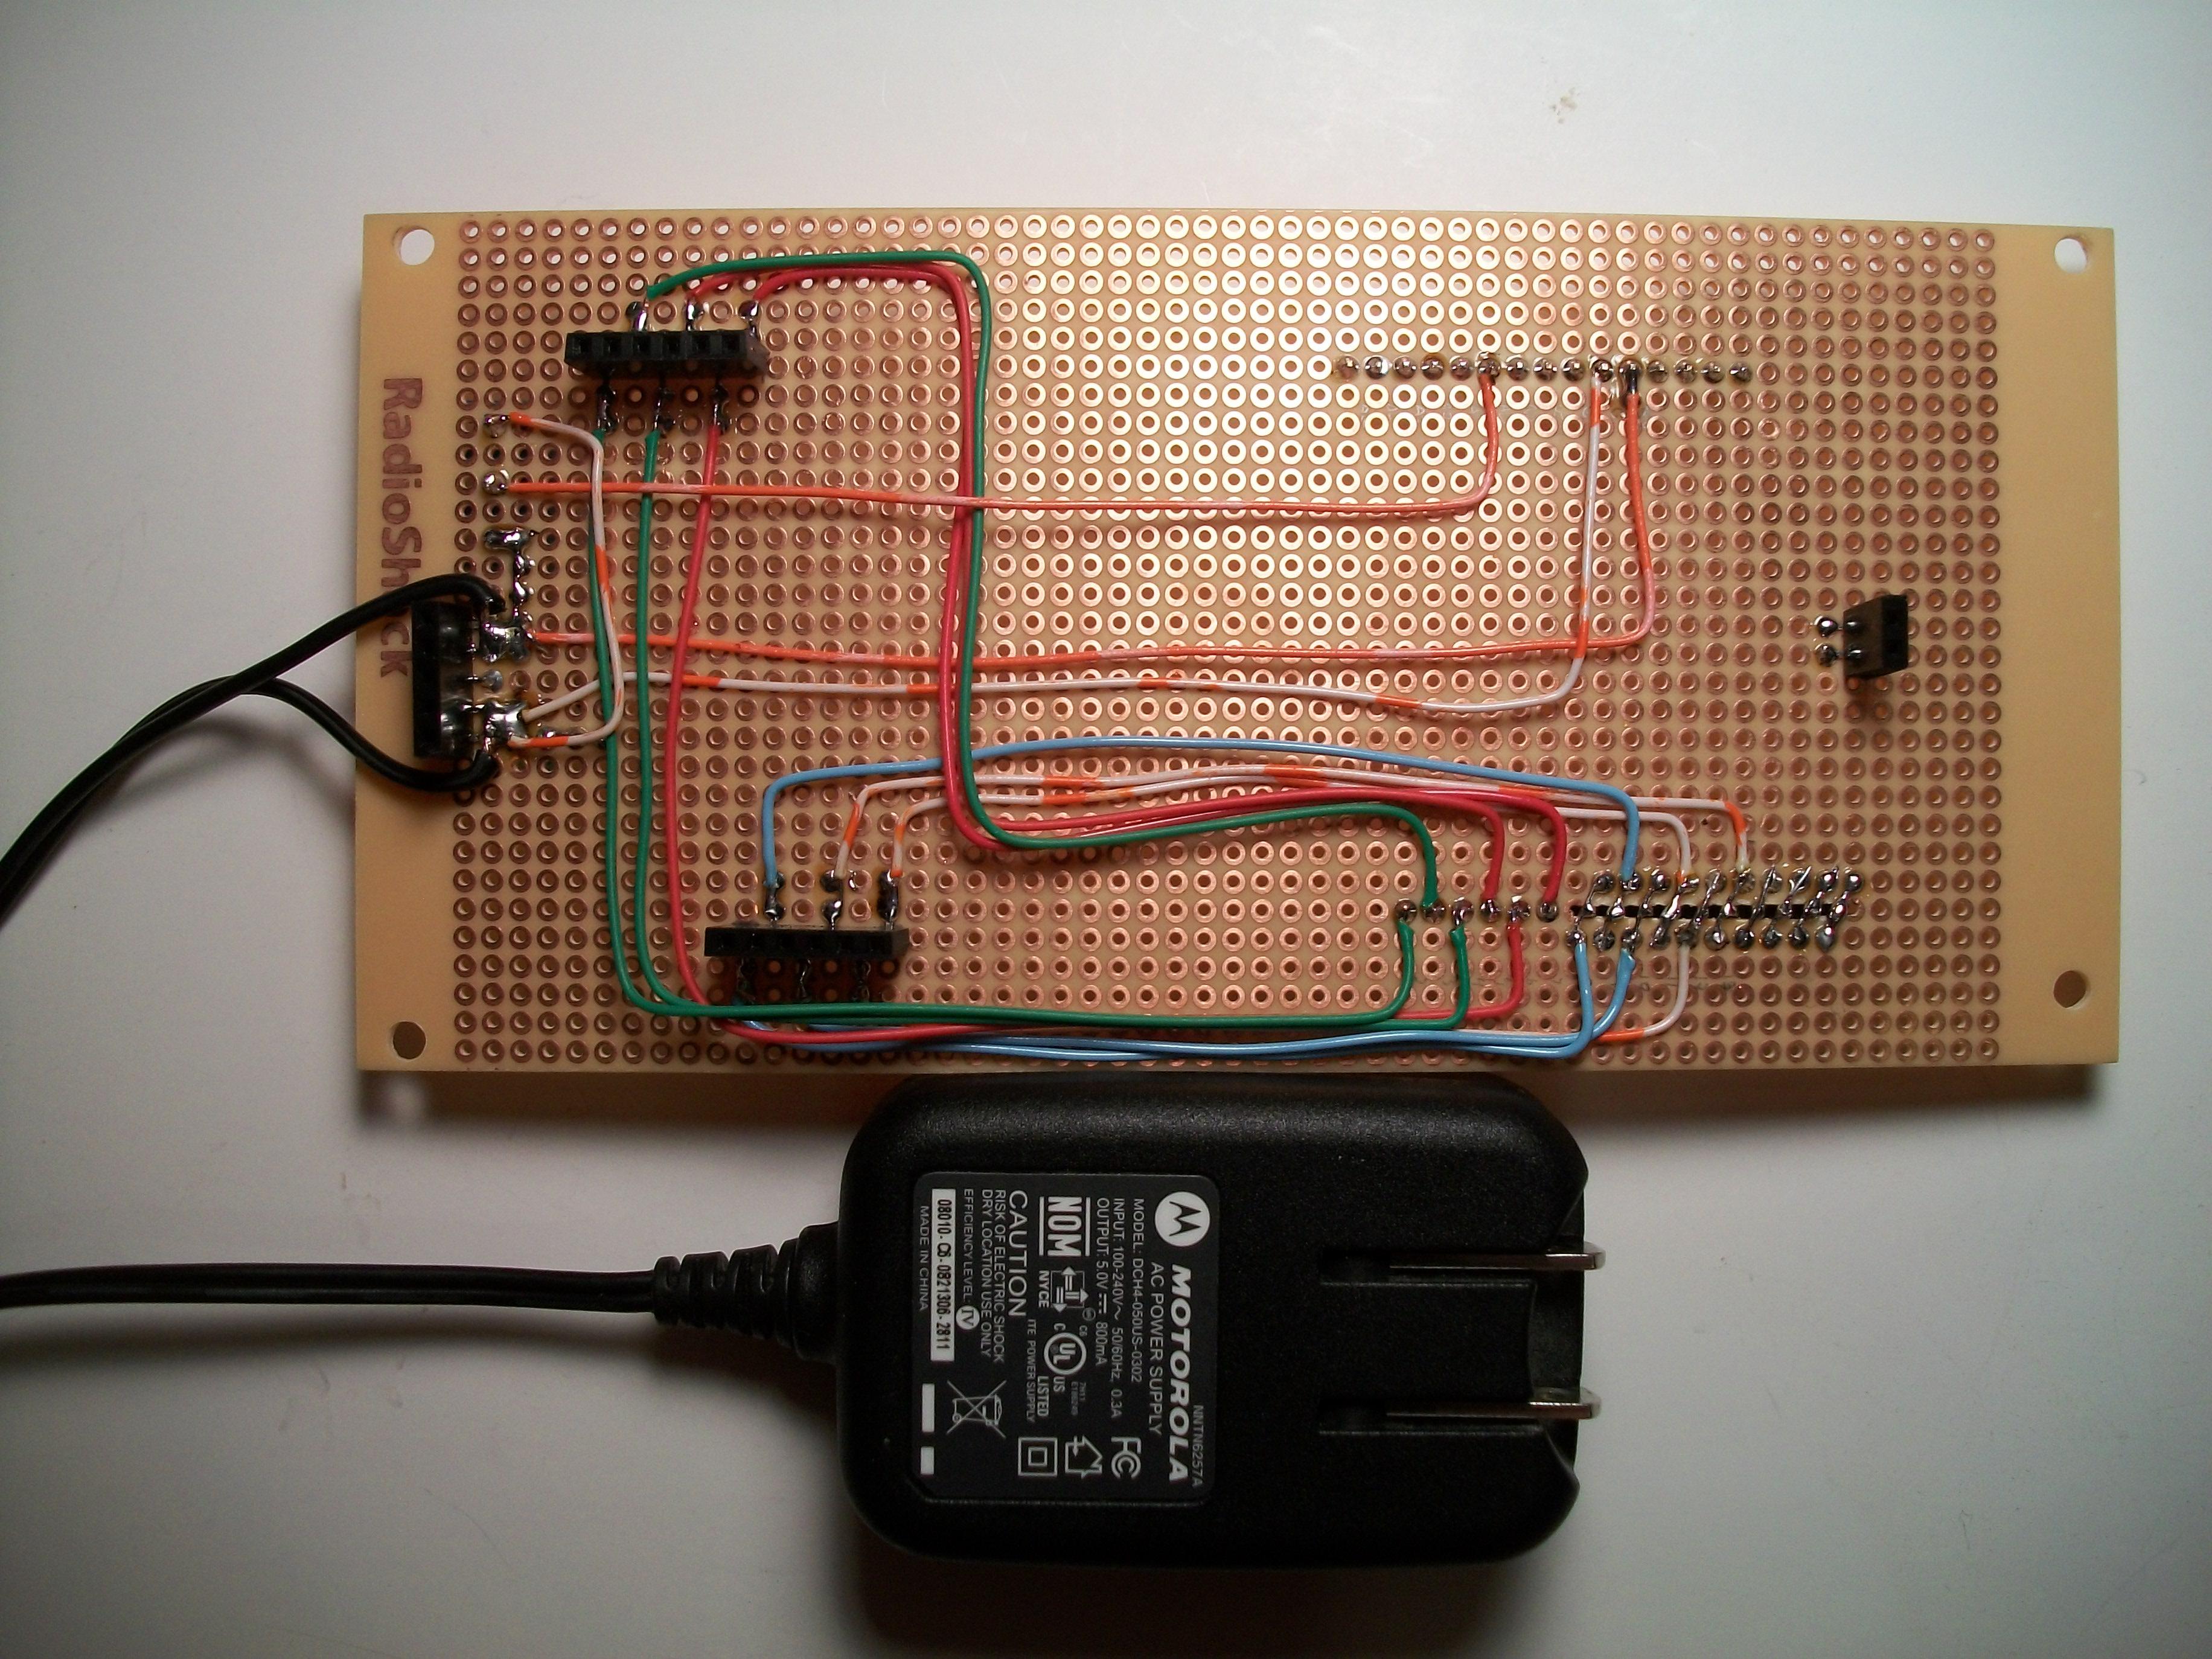 Picture of Arduino Board